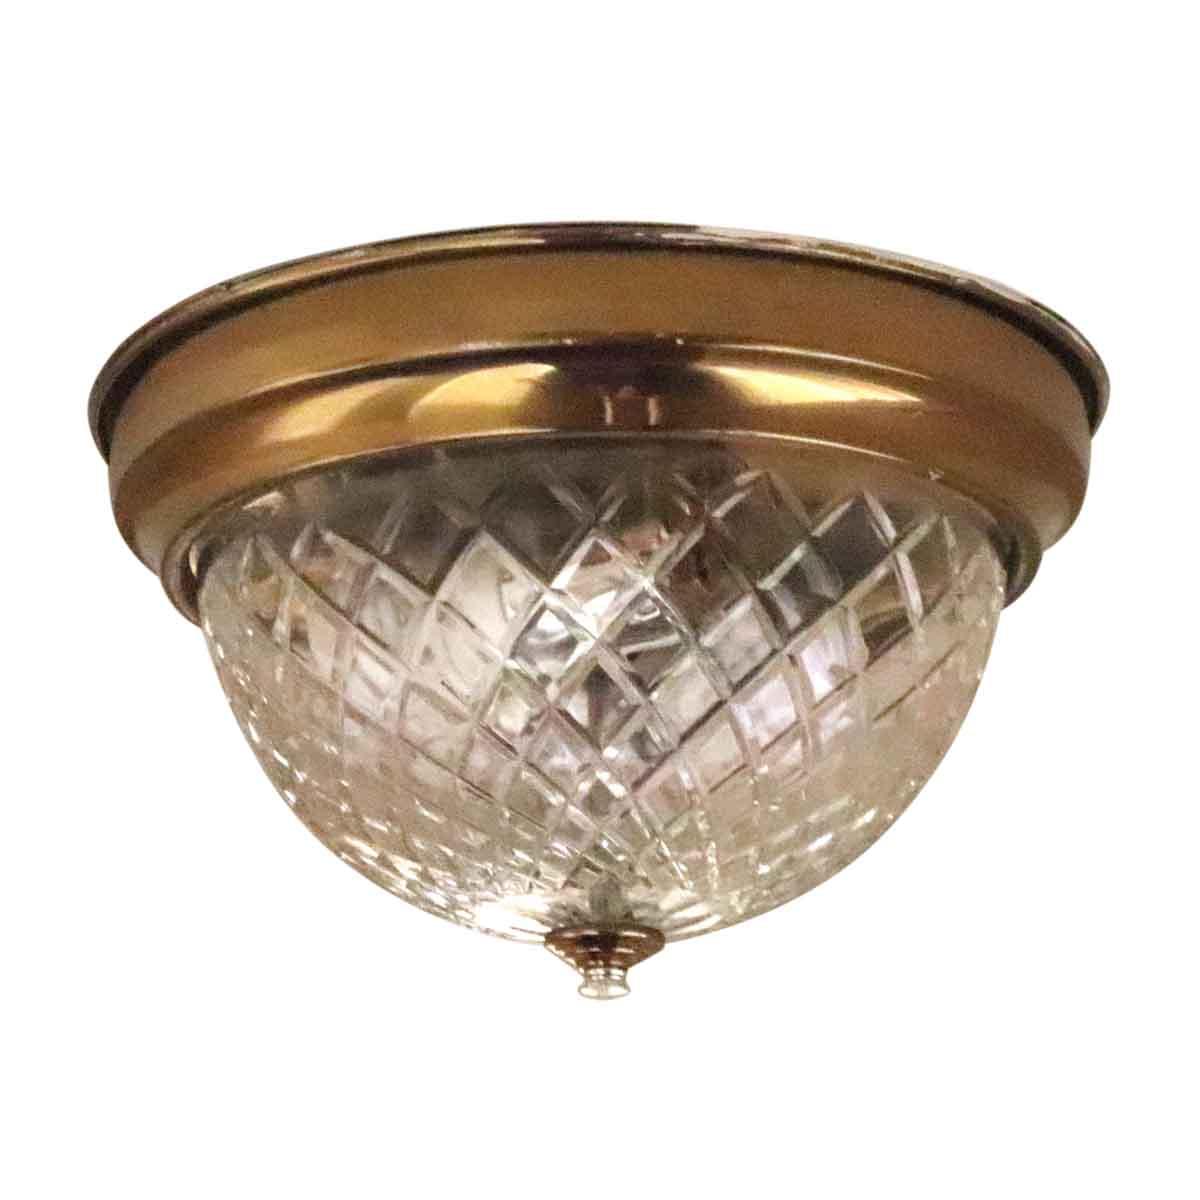 Salvaged Waldorf Cut Crystal Flush Mount Light